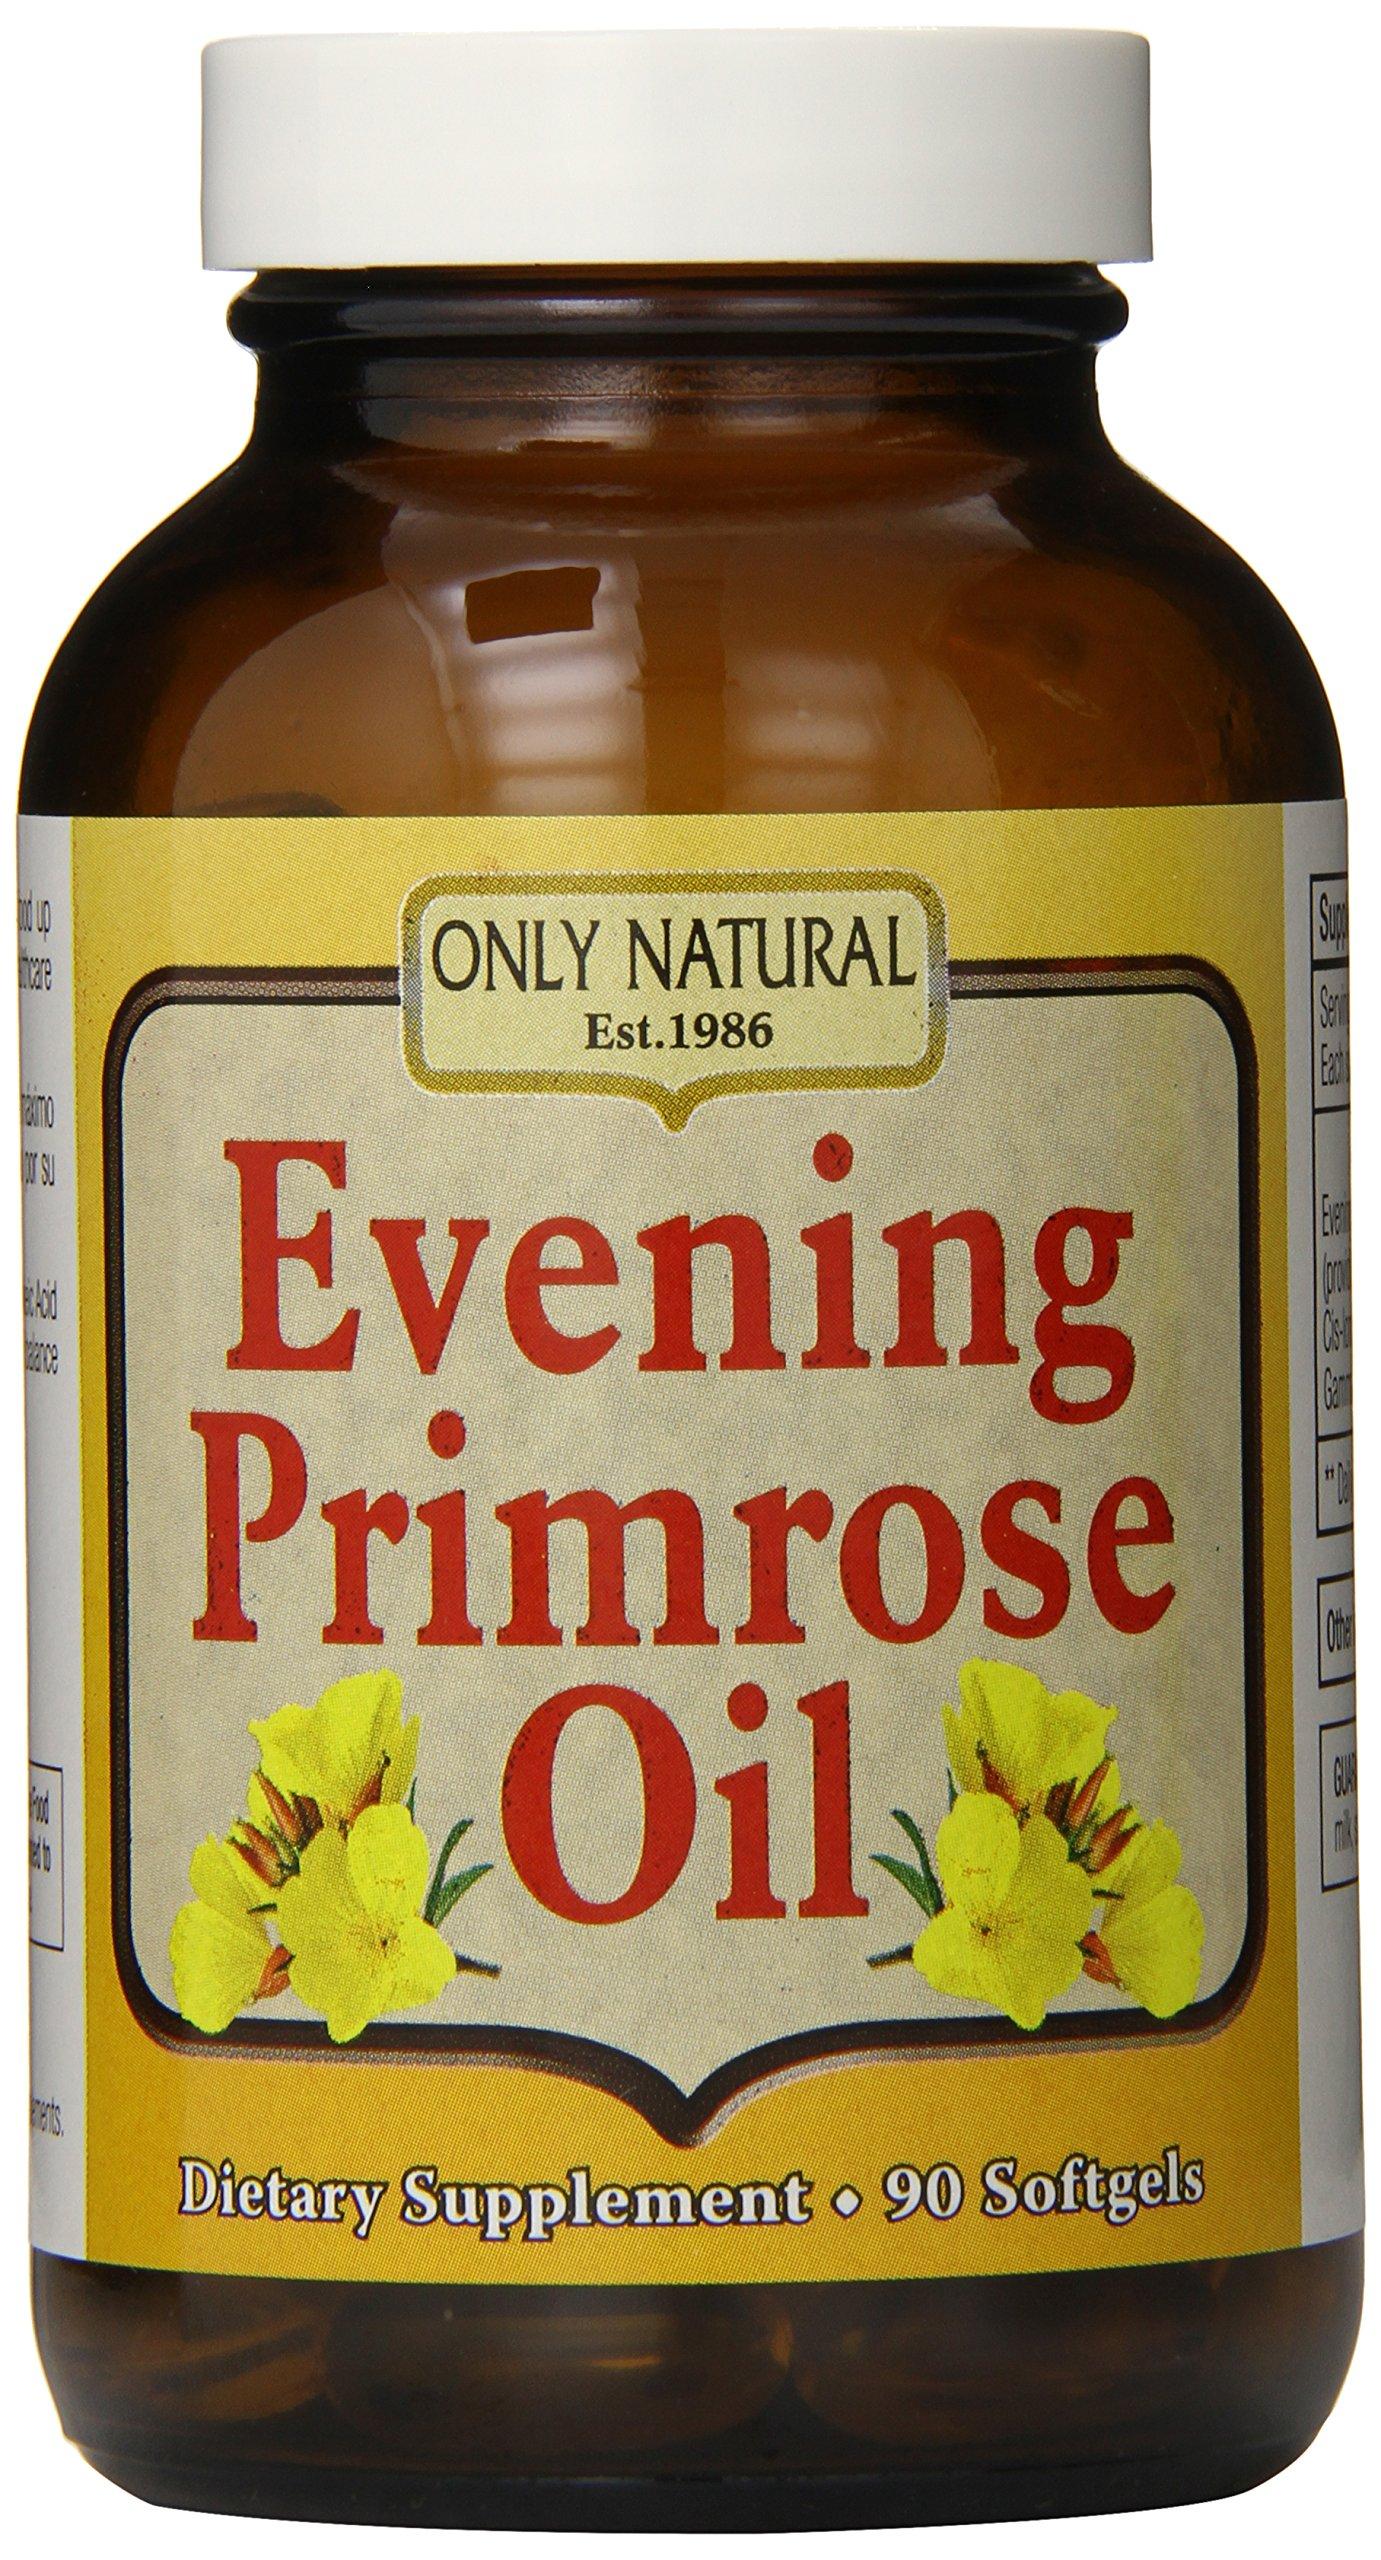 Only Natural Nutritional Supplement Softgels, Evening Primrose Oil, 90 Count